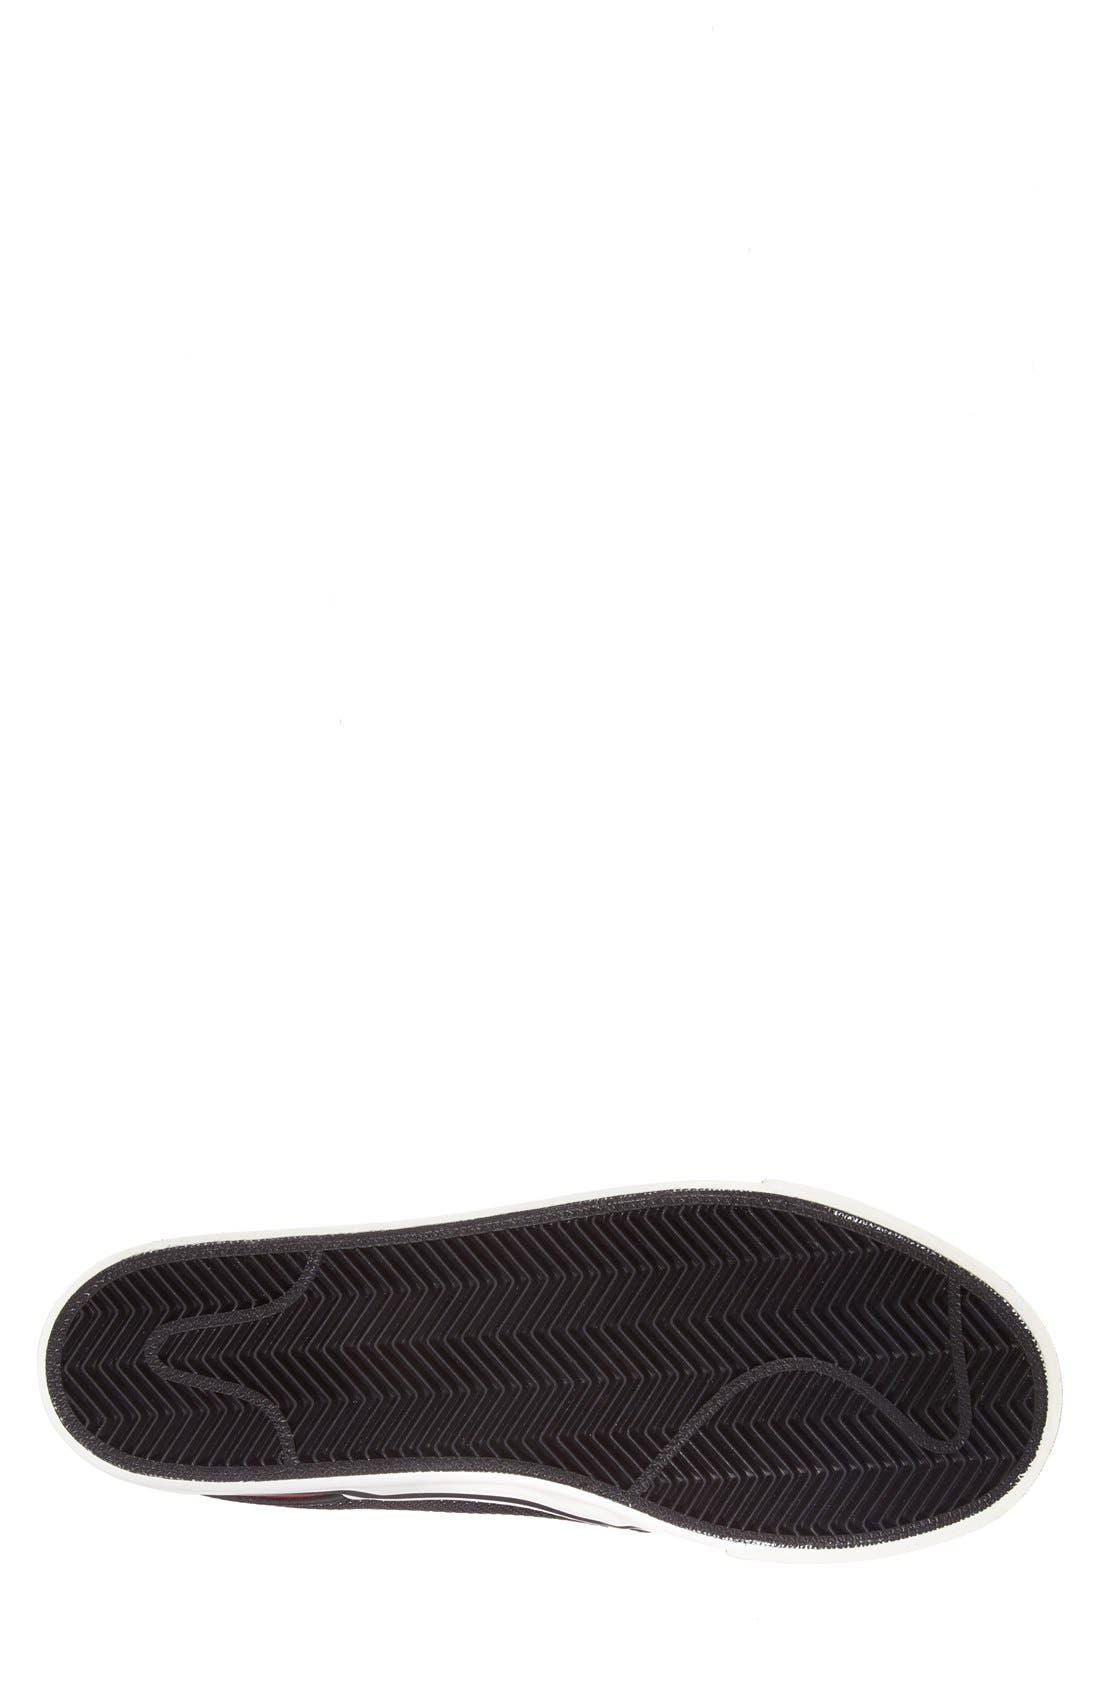 Zoom - Stefan Janoski SB Canvas Skate Shoe,                             Alternate thumbnail 170, color,